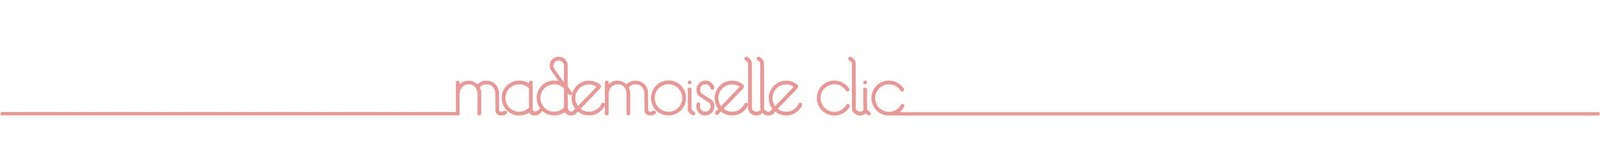 Mademoiselle Clic